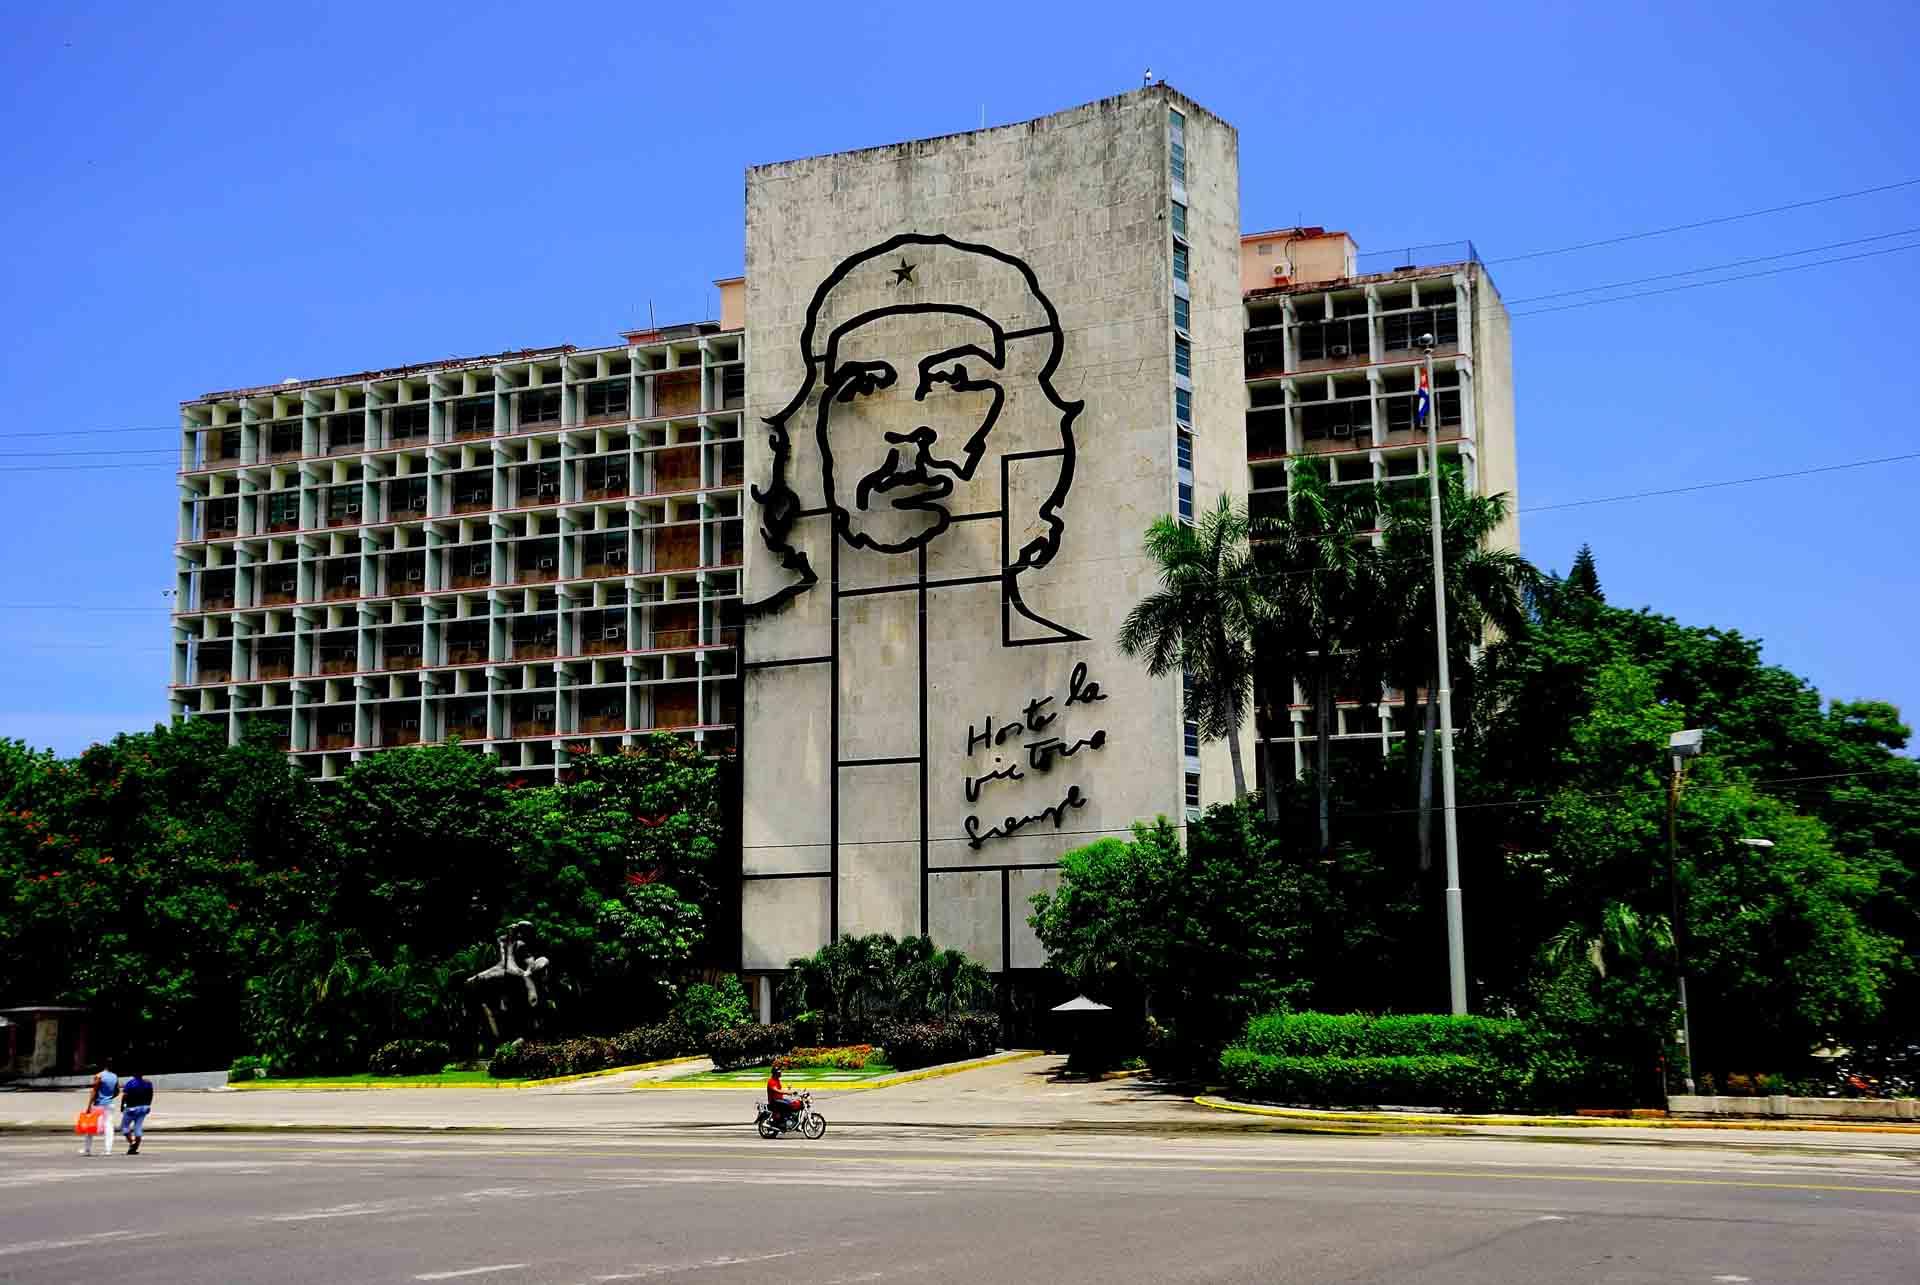 Placa de la Revolucion Havana Cuba, havana, cuba, pescart, photo blog, travel blog, blog, photo travel blog, enrico pescantini, pescantini